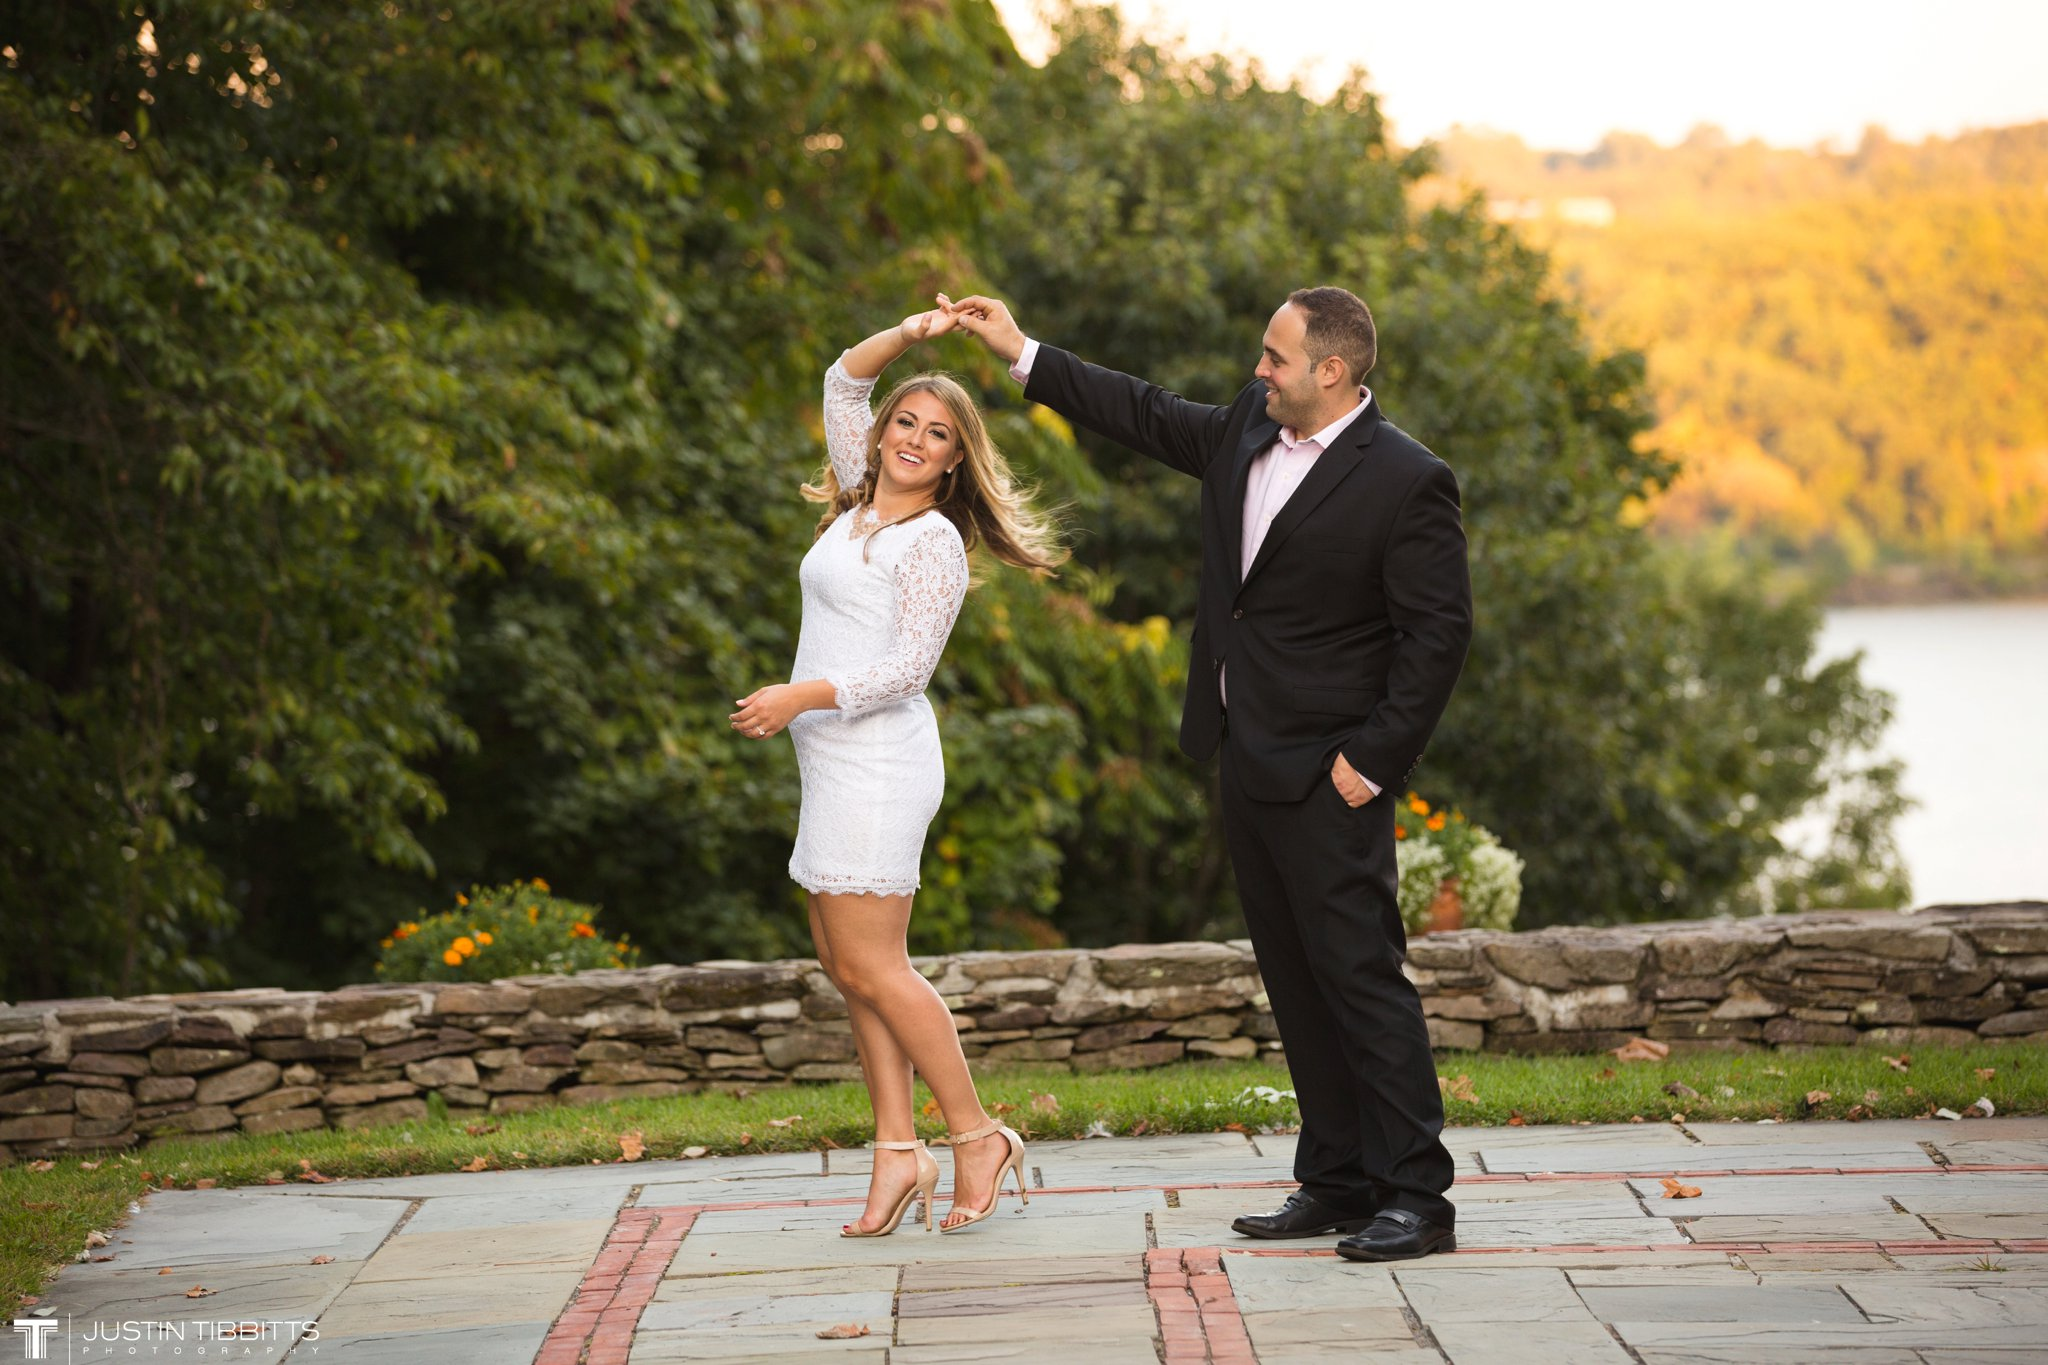 Buttermilk Falls Inn Engagement Photos with Amanda and Nick-134